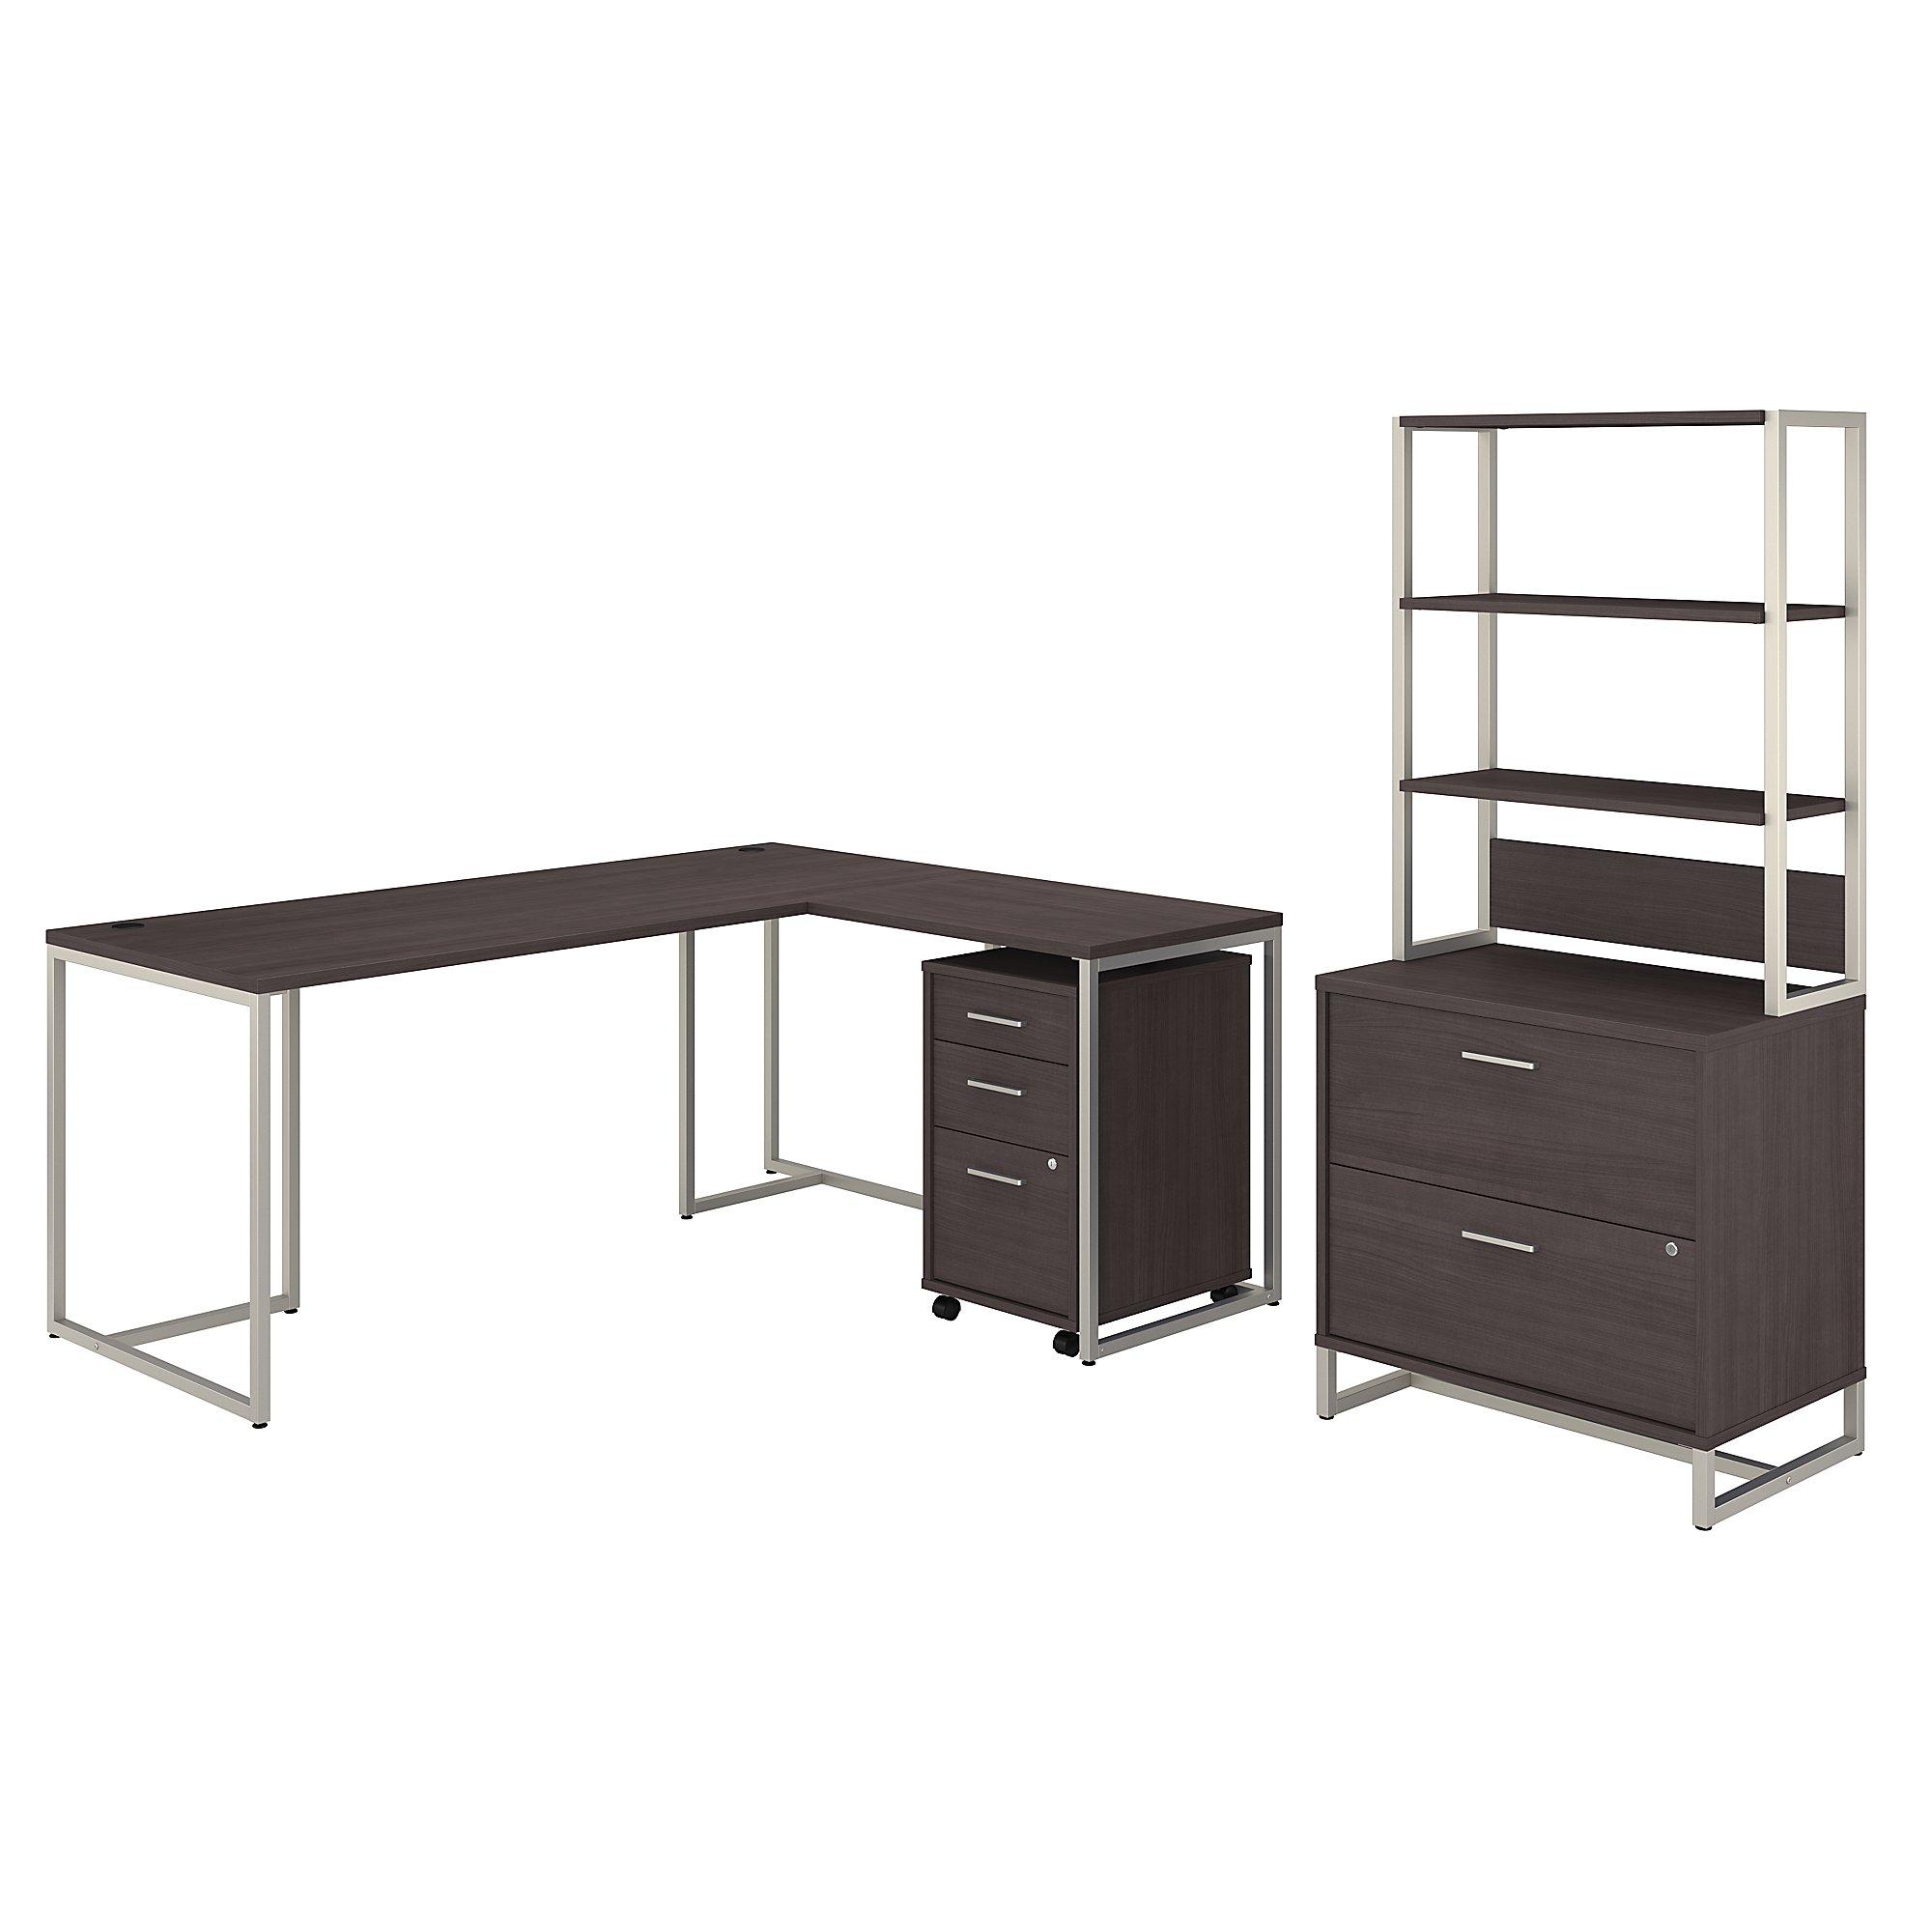 kathy ireland method executive furniture set in storm gray